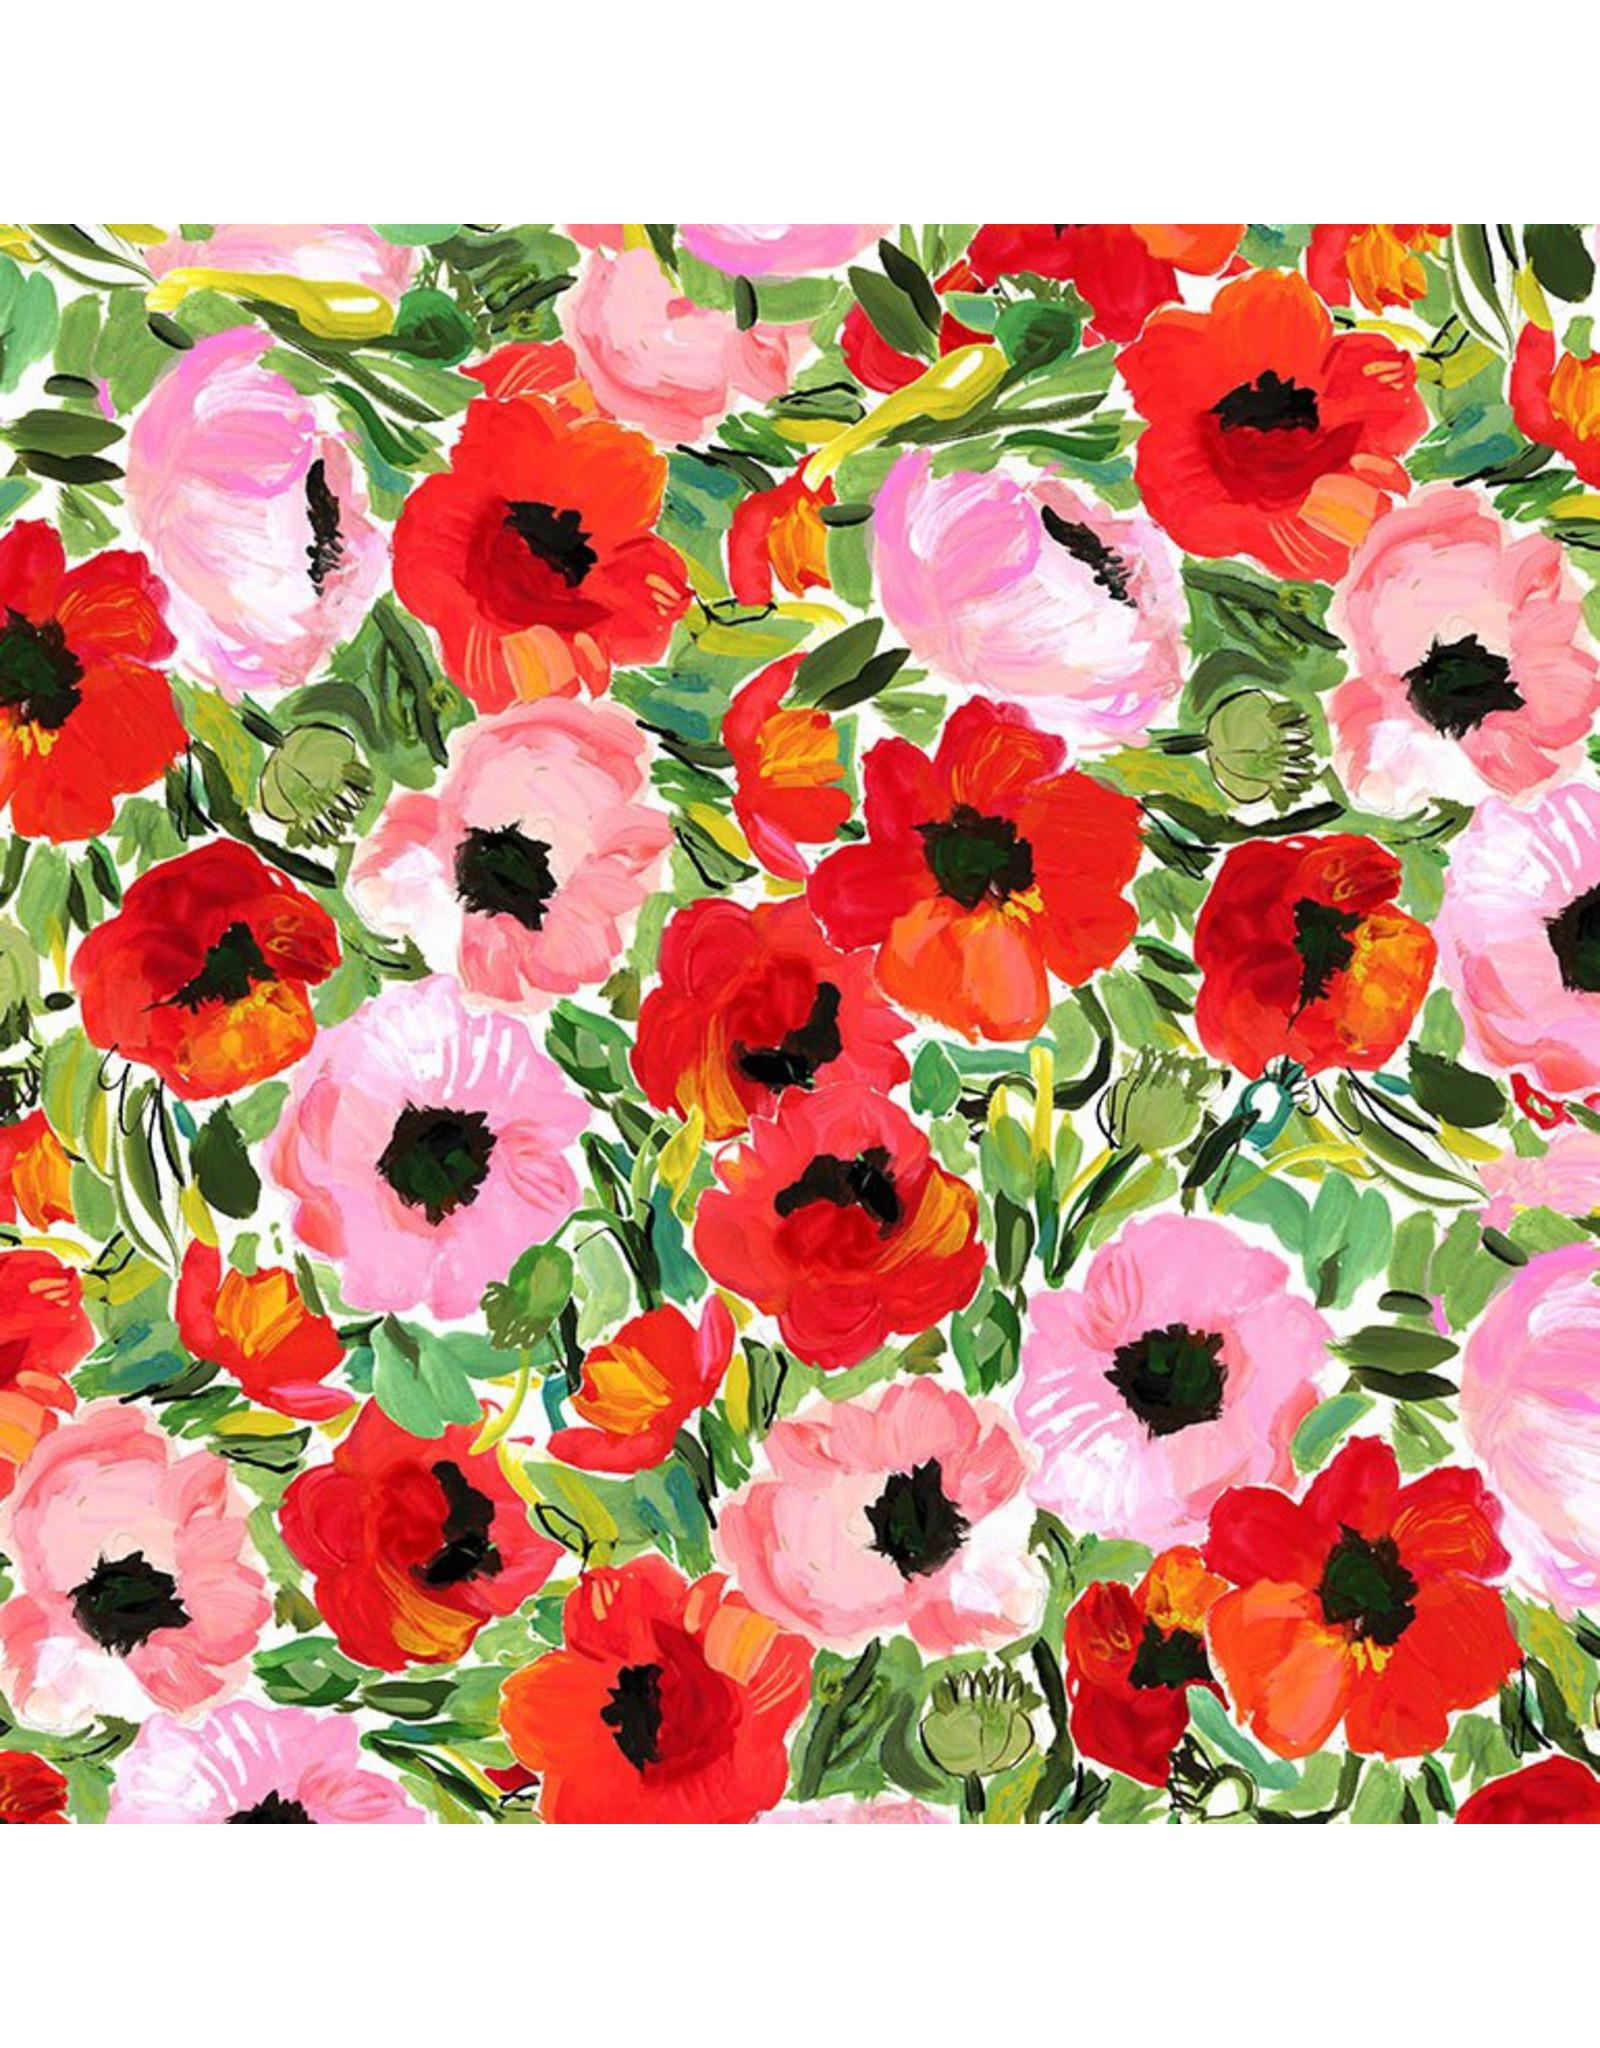 August Wren Chef's Table, Poppy Field in Multi, Fabric Half-Yards